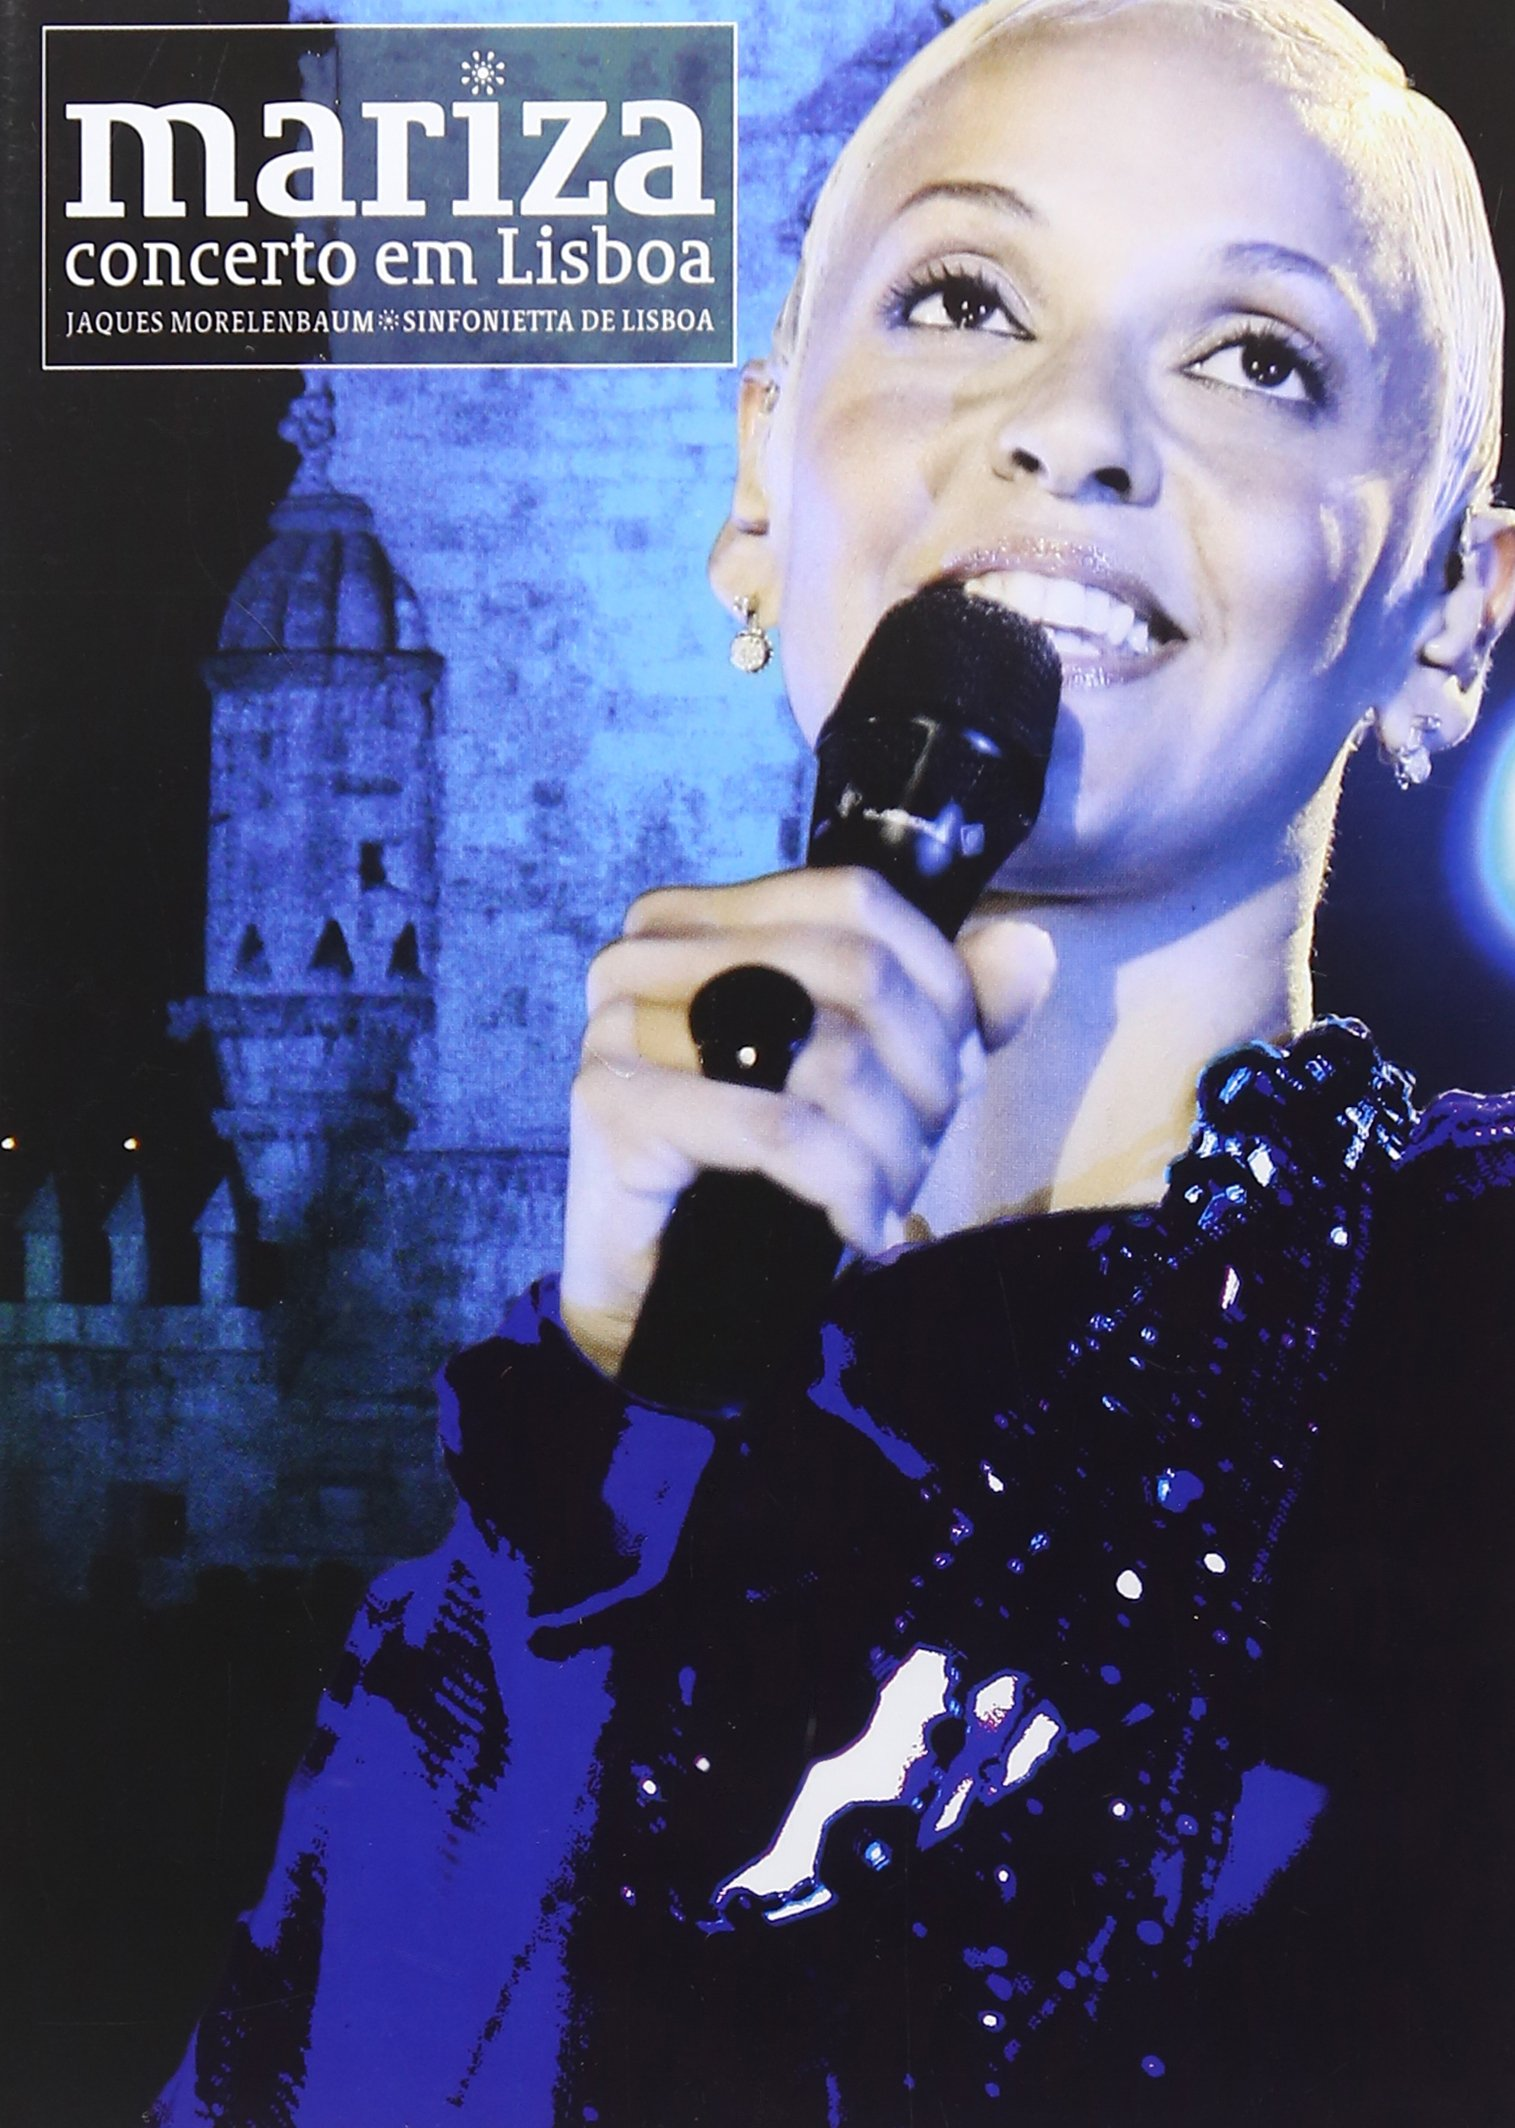 DVD : Mariza - Mariza: Concerto Em Lisboa (Full Frame, Colorized)